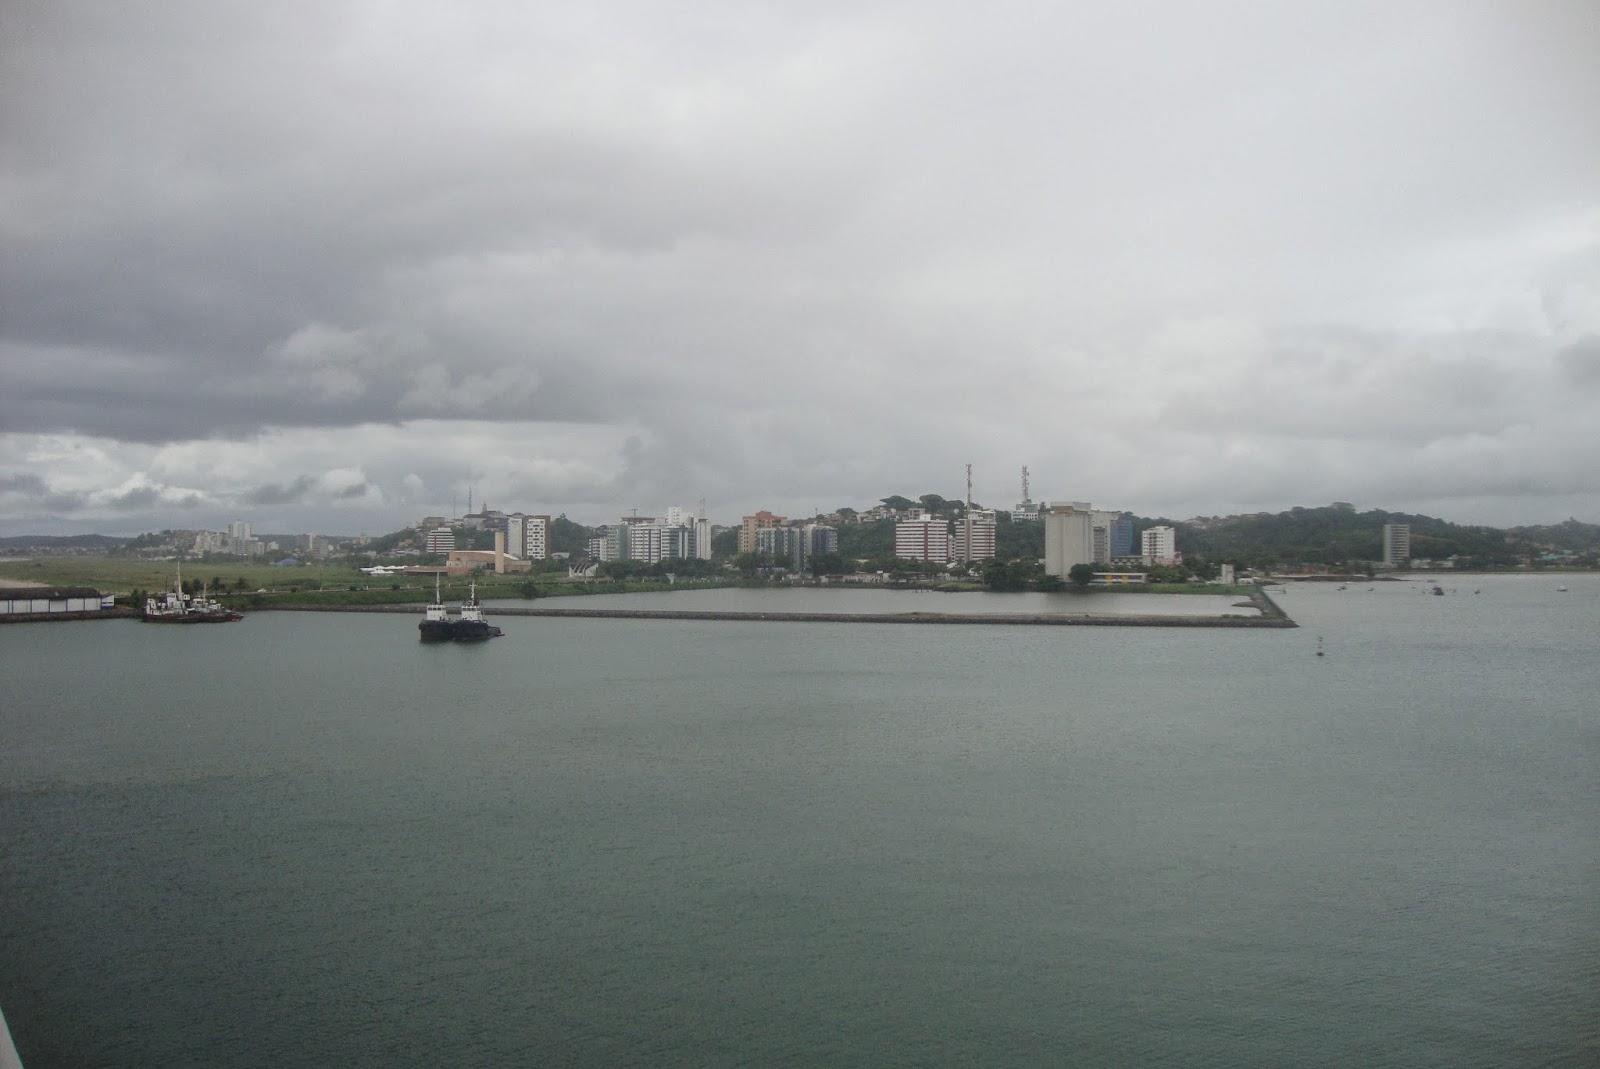 Ilhéus vista do navio ancorado no porto.